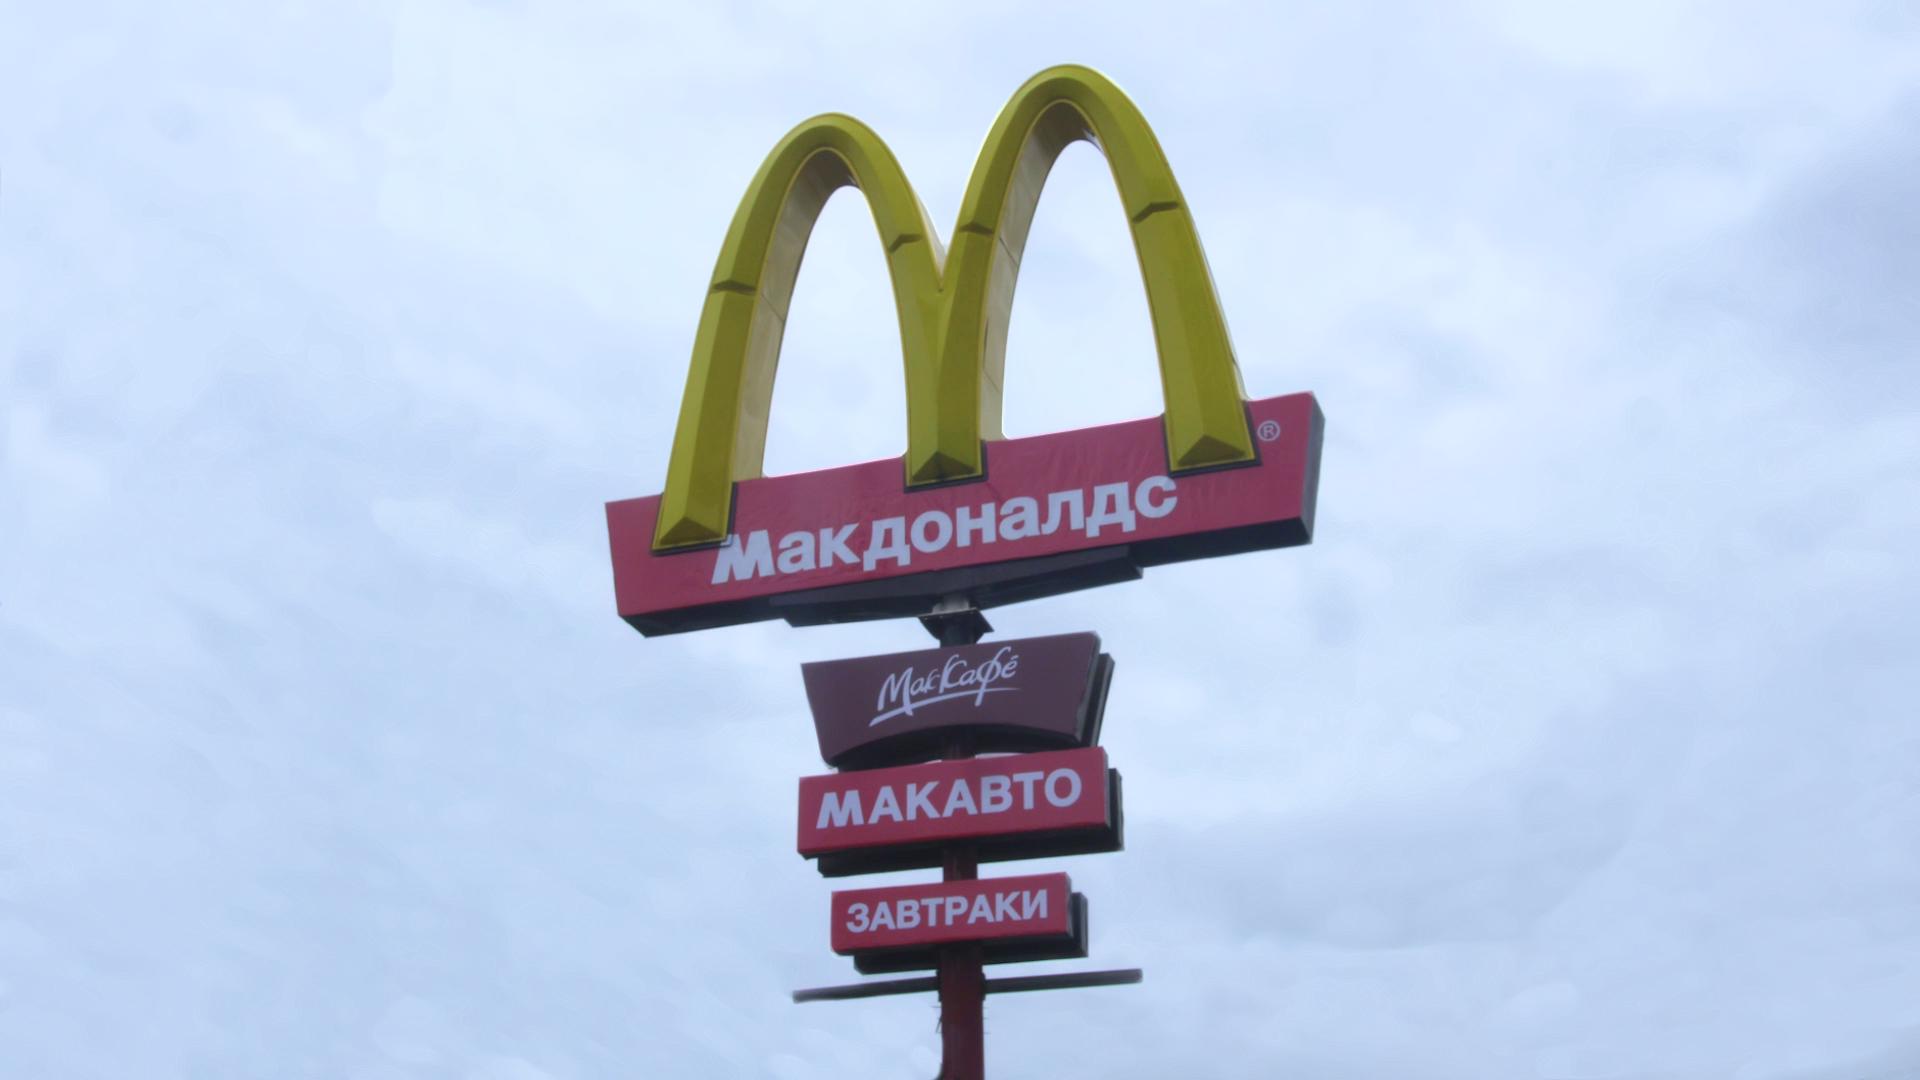 McDonald's - Russia 2018